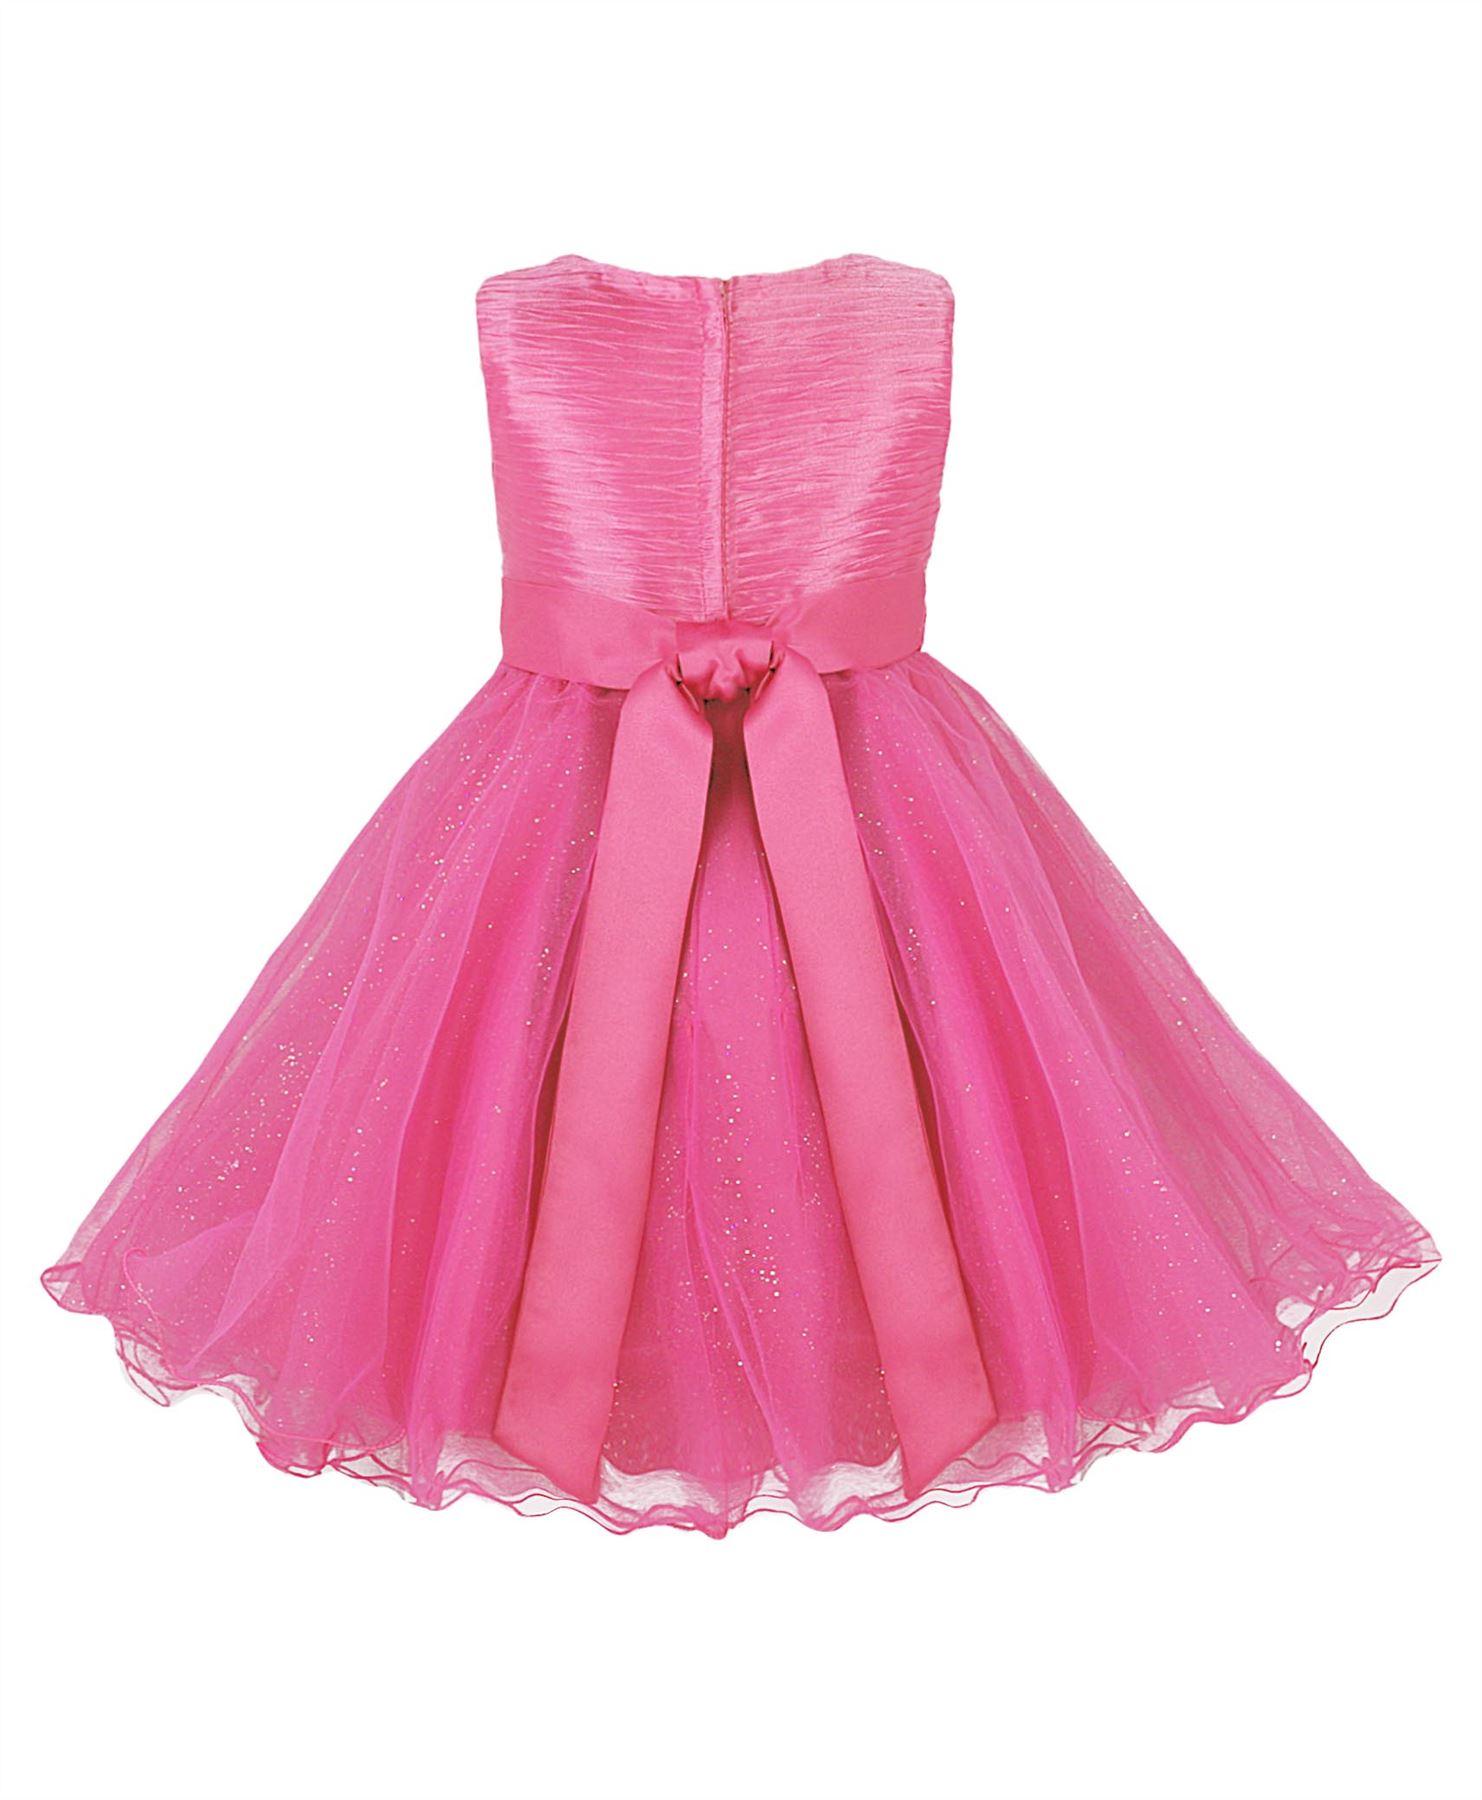 niña tul vestido de Fiesta Adorno Lazo Dama de honor boda madrina ...